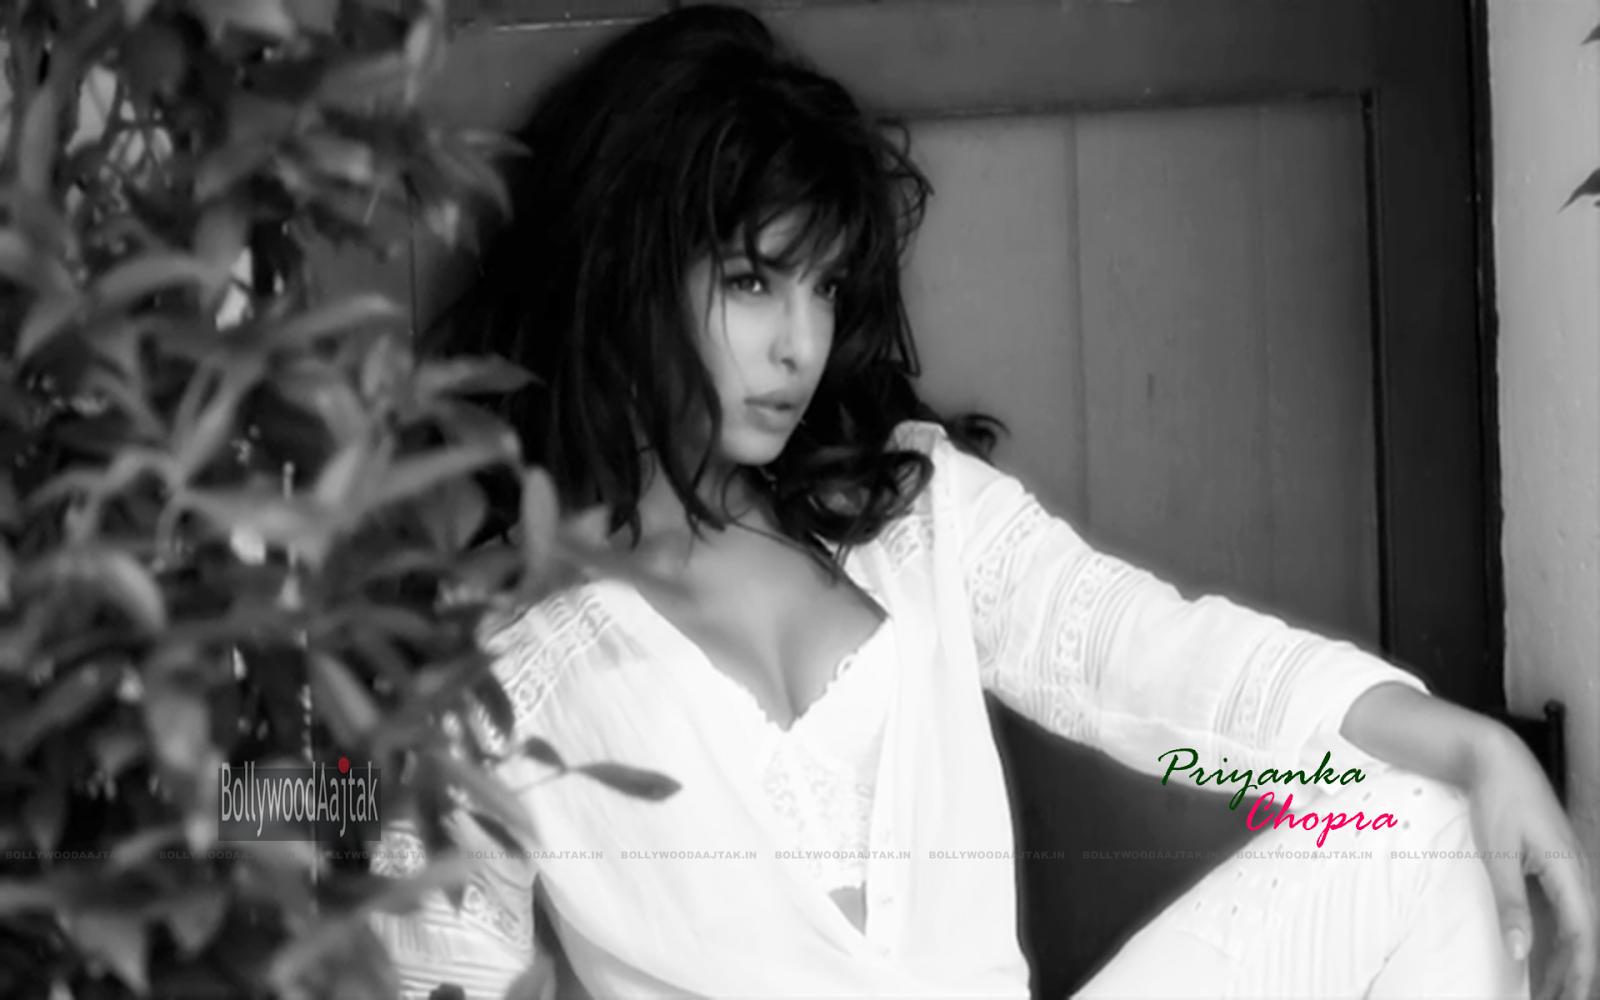 Priyanka Chopra Priyanka Chopra Hot Wallpapers-2760